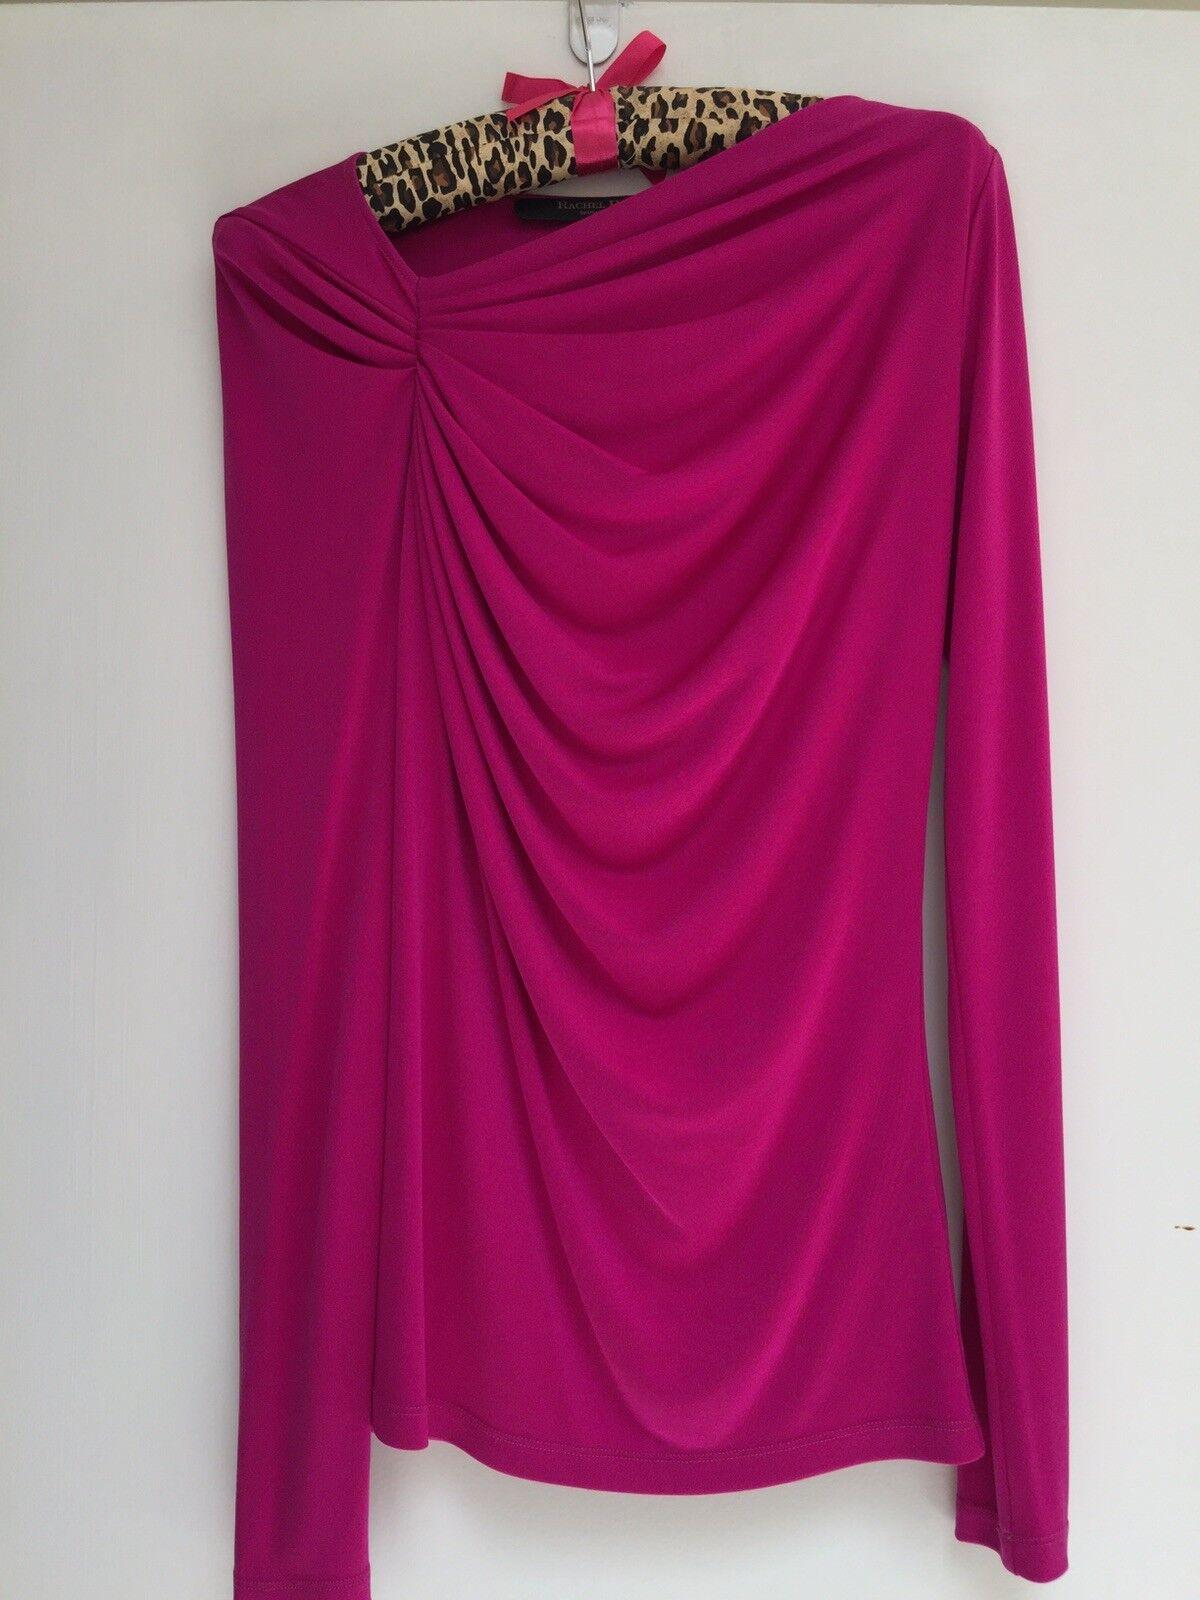 Rachel Roy Magenta Blouse Size XS